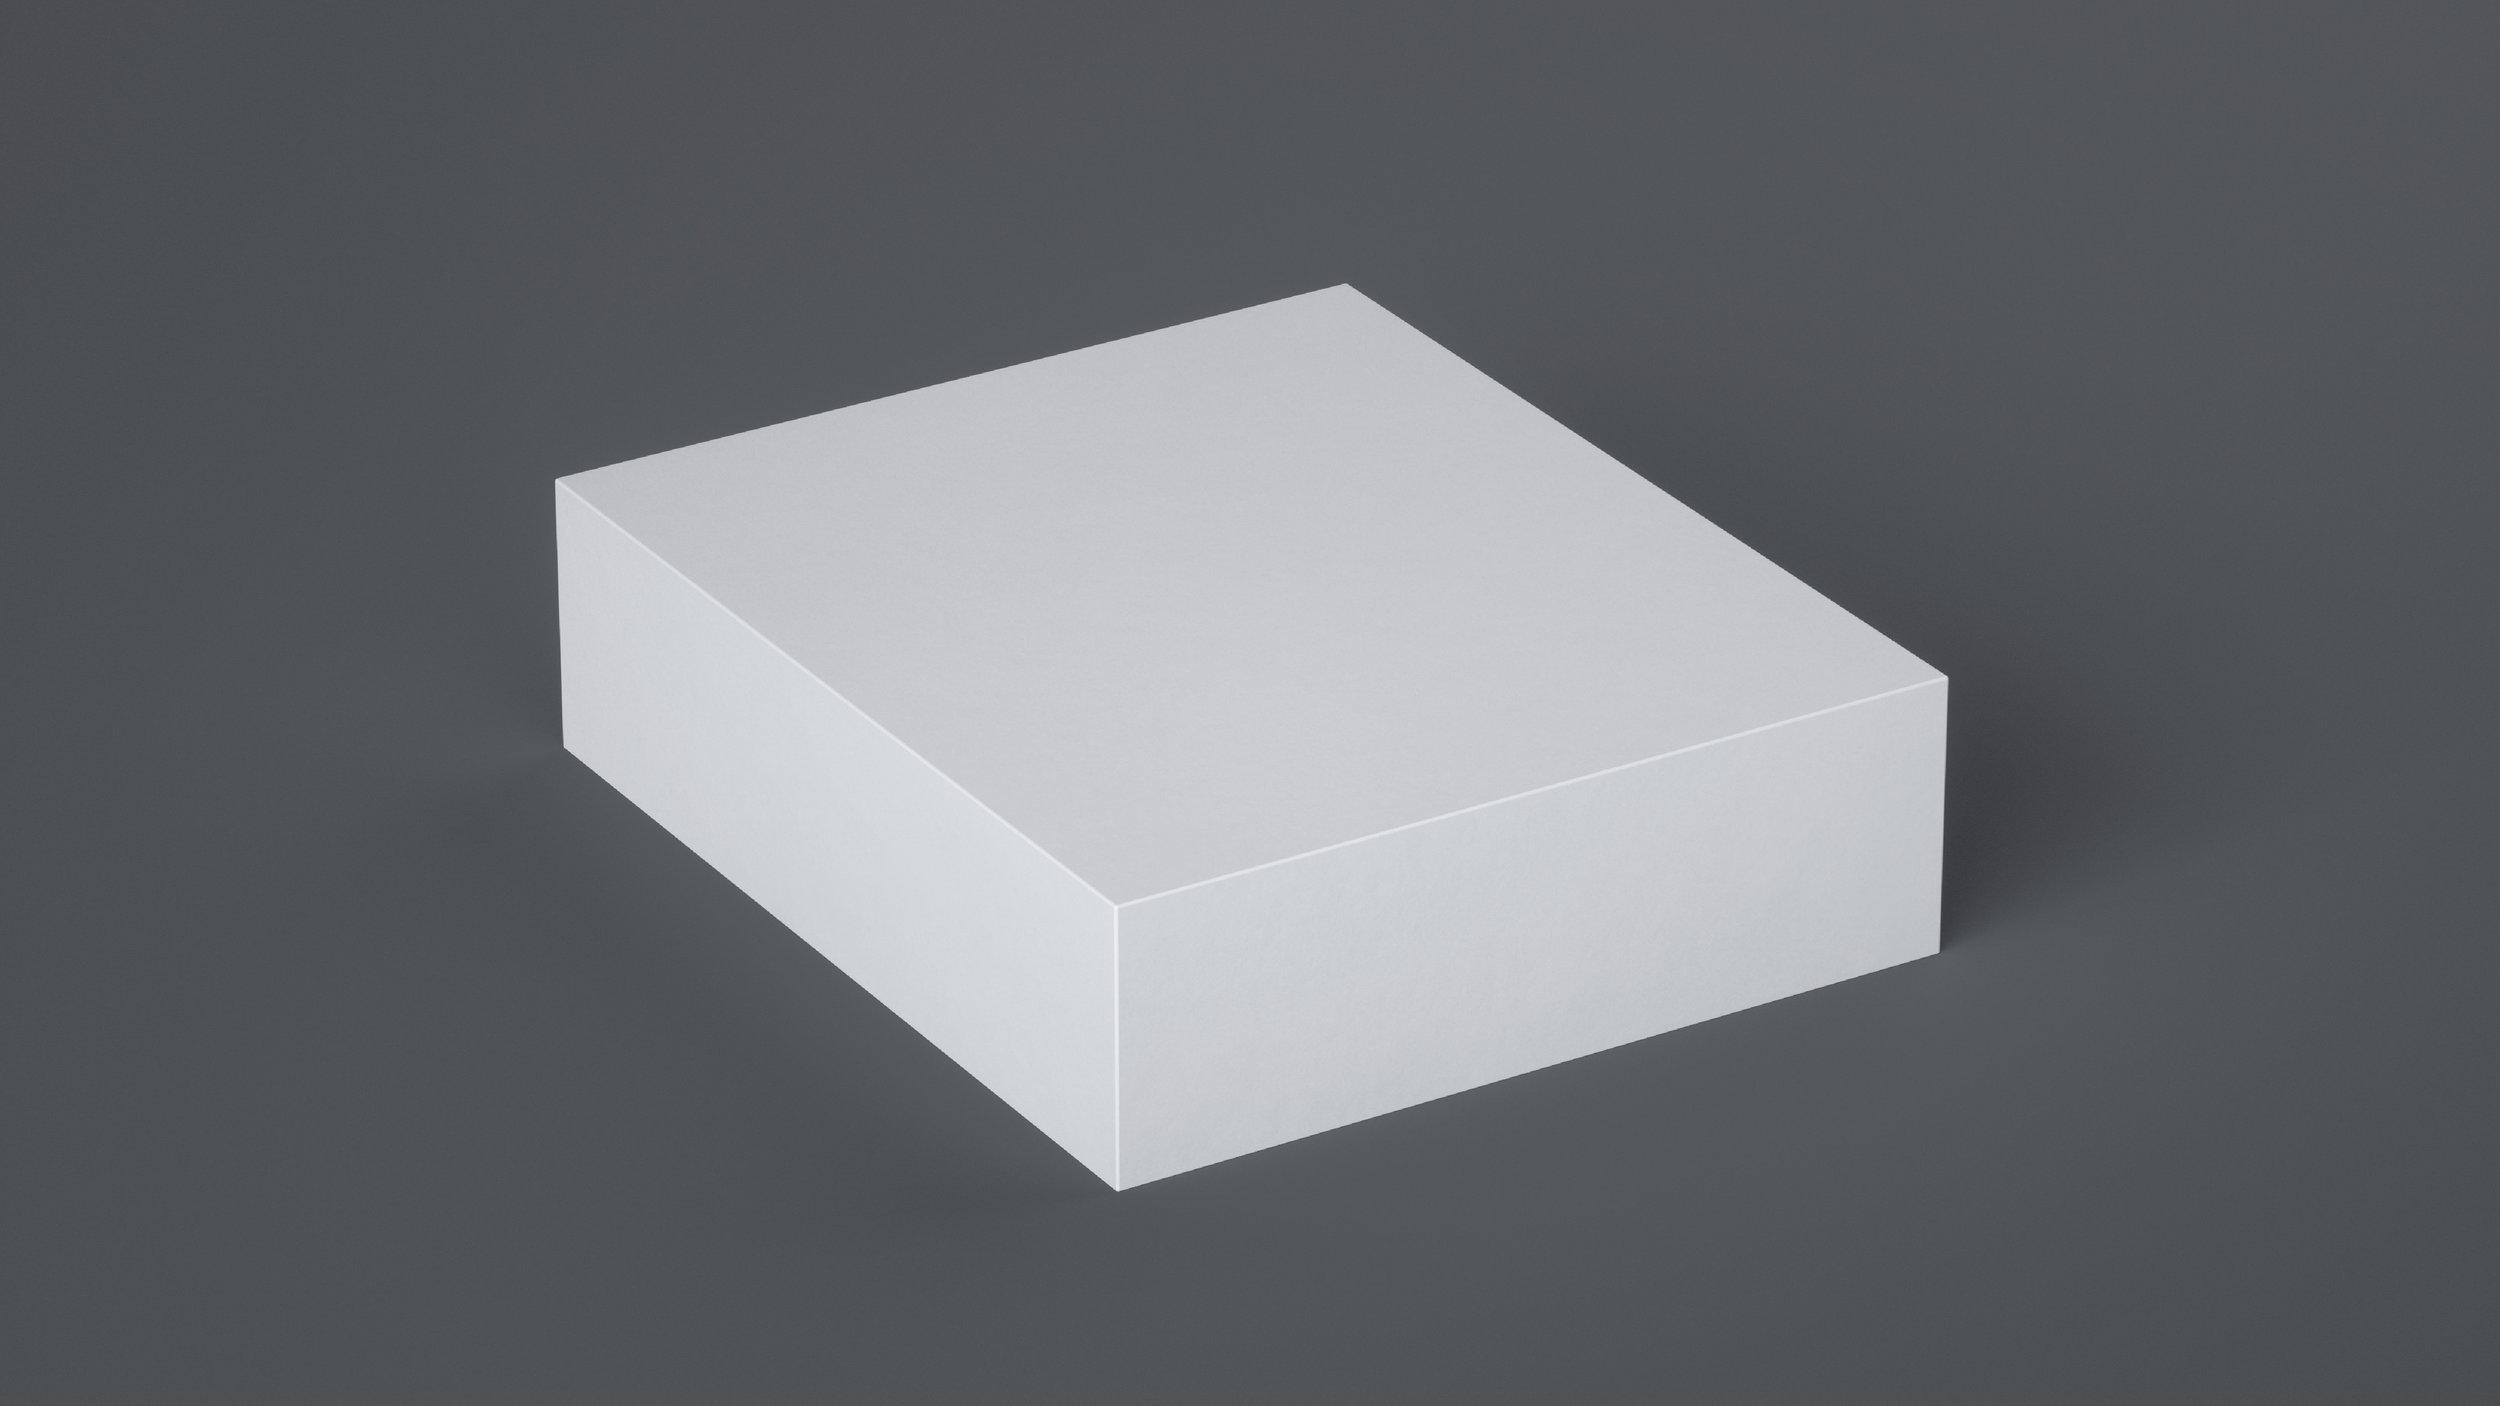 B&W_LibertySuite_PackagingStructure_R179.jpg